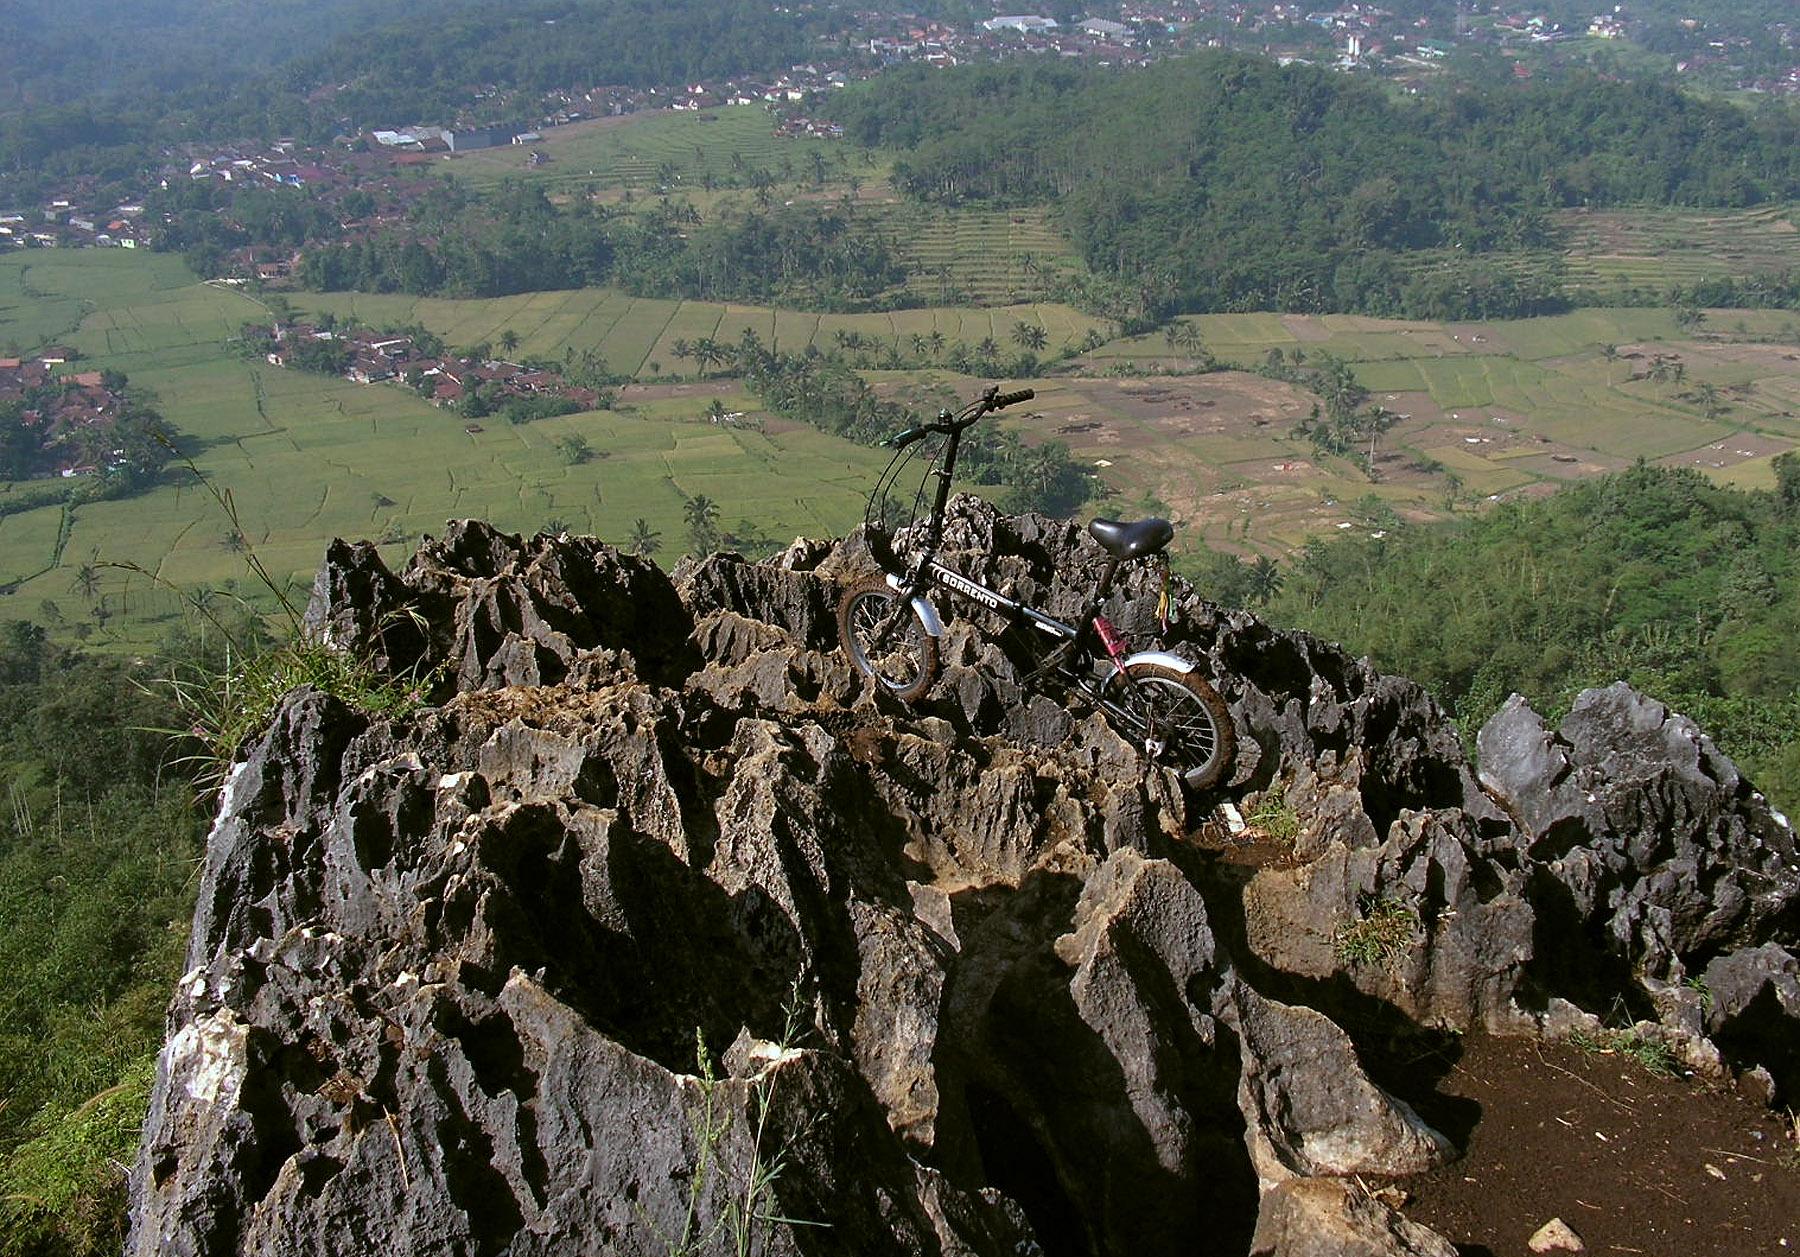 Gowes Blusukan ke Puncak Bukit Karang Para di Sukabumi – BASABASI.CO